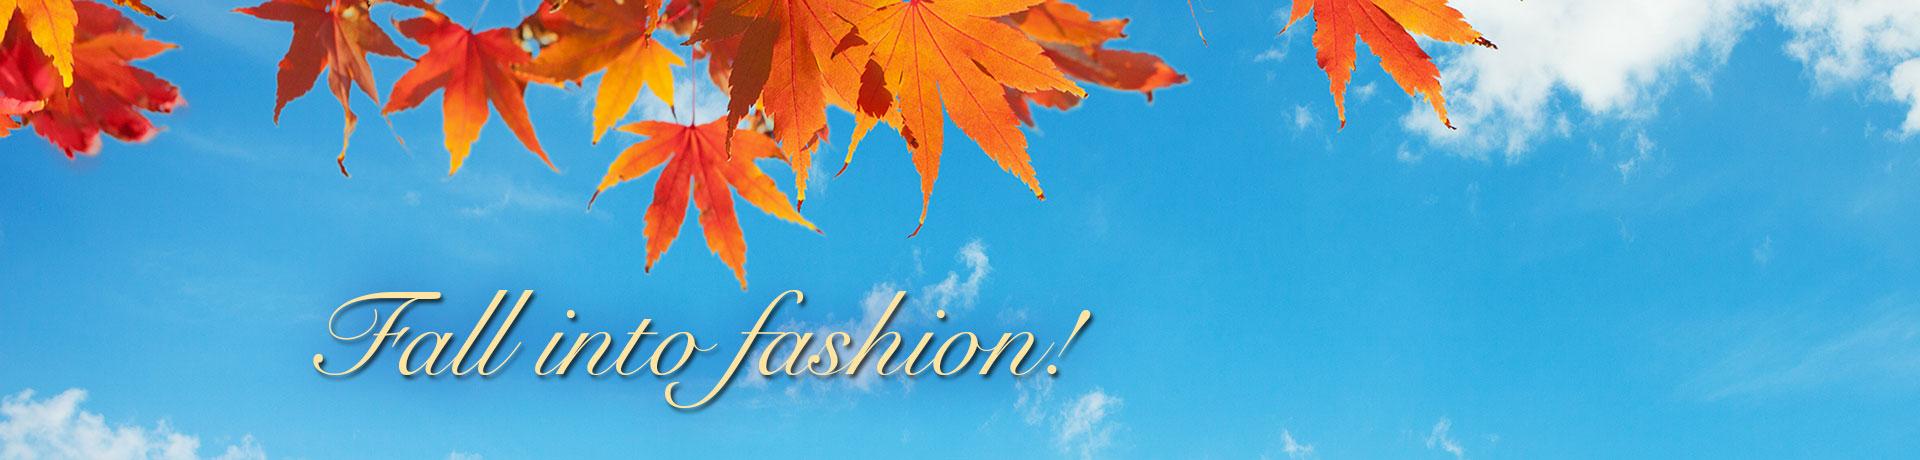 fall-banner2